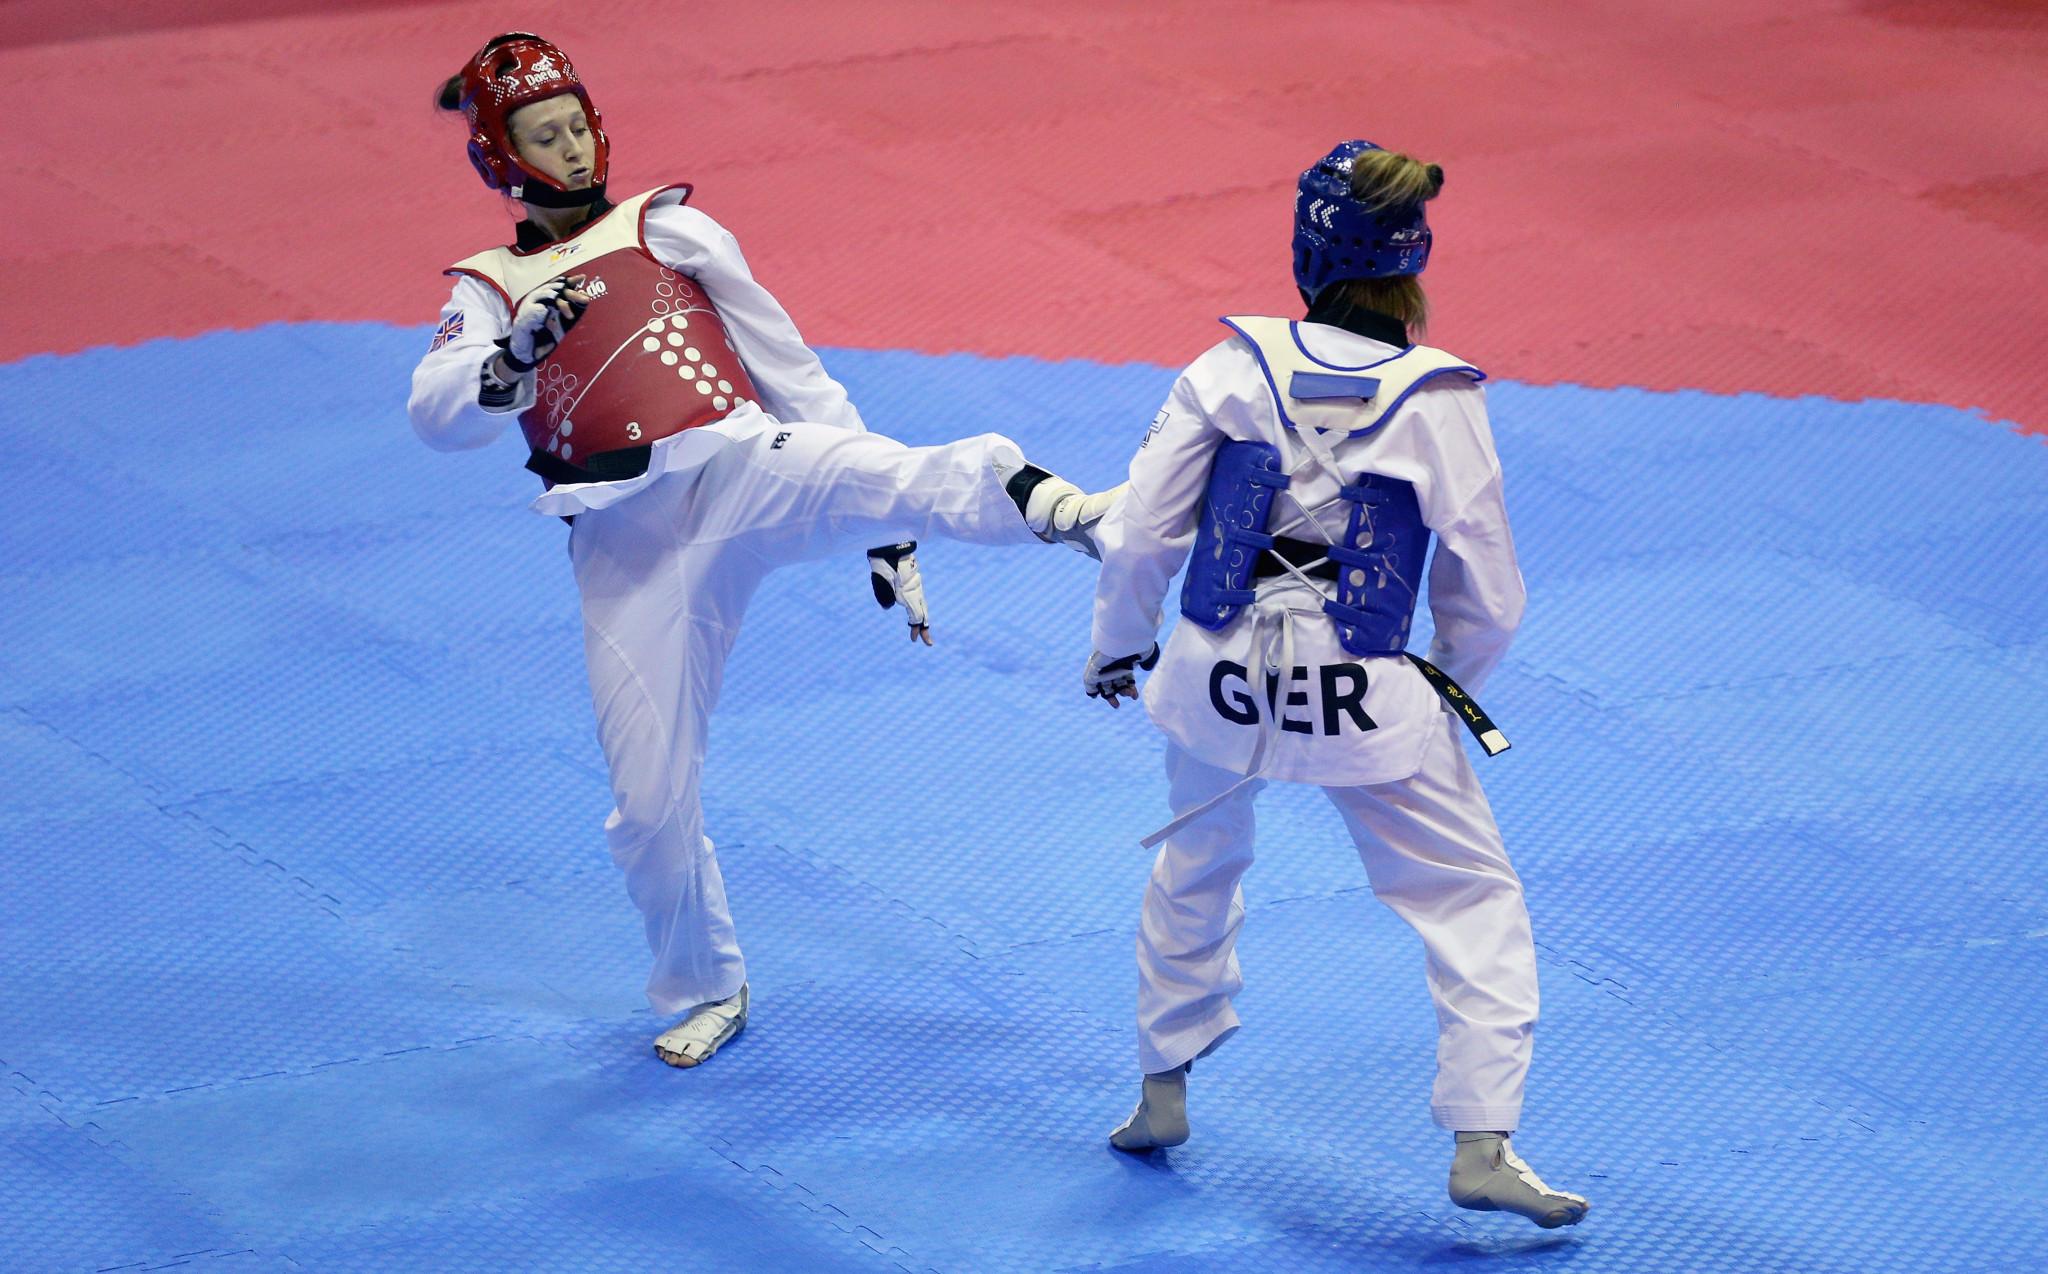 Taekwondo Axel Müller club wins Green Belt award and grant